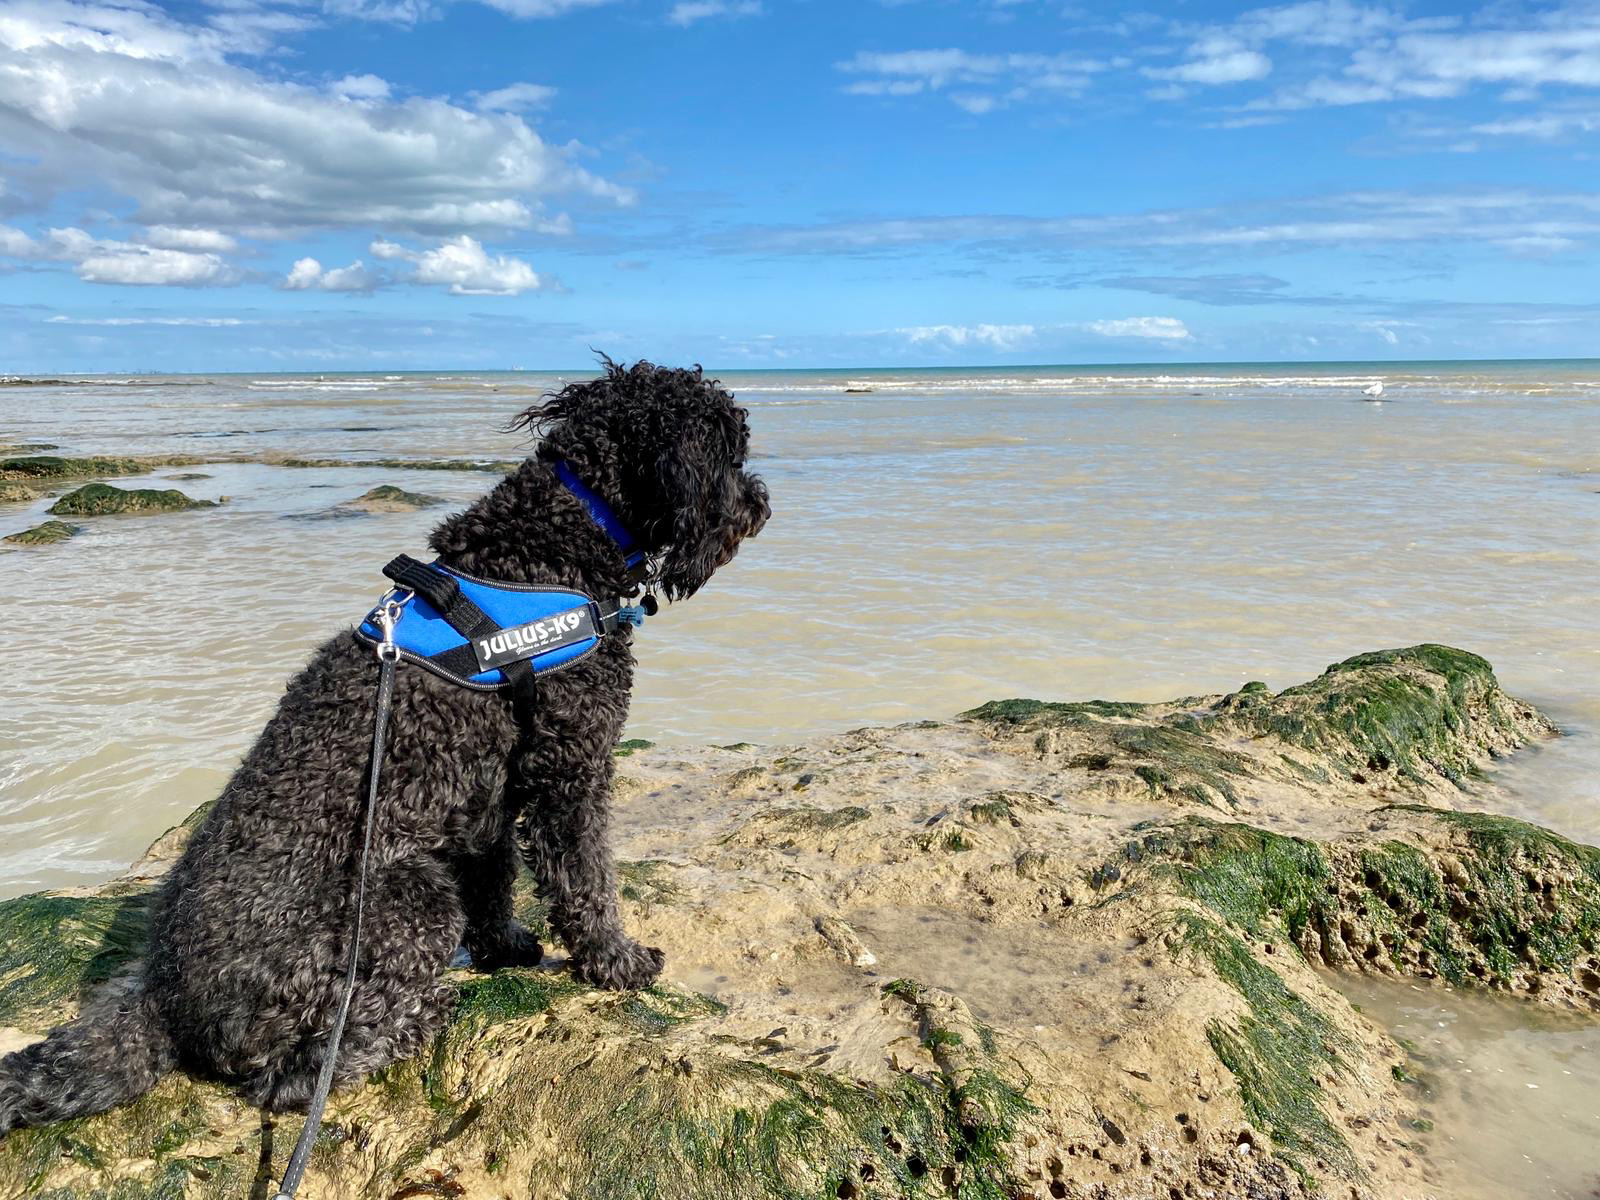 dog boarding tooting balham clapham cockapoo on pett level beach